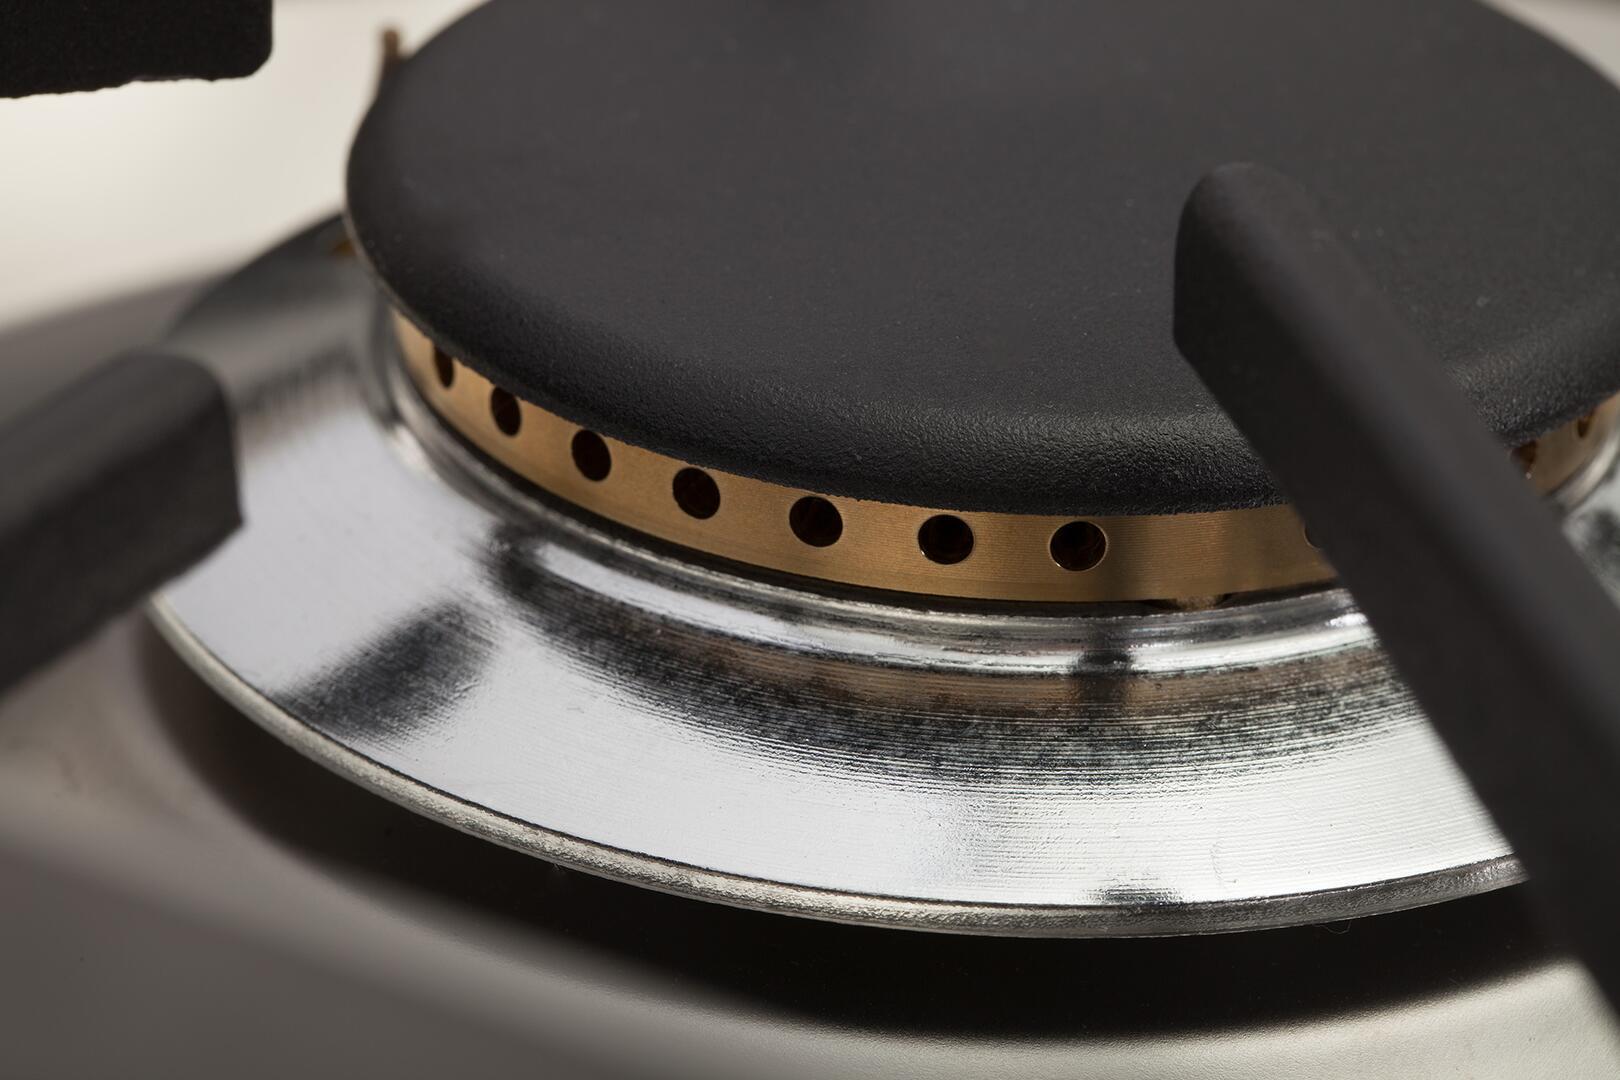 Ilve Professional Plus UPDW90FDMPM Freestanding Dual Fuel Range Gray, 4